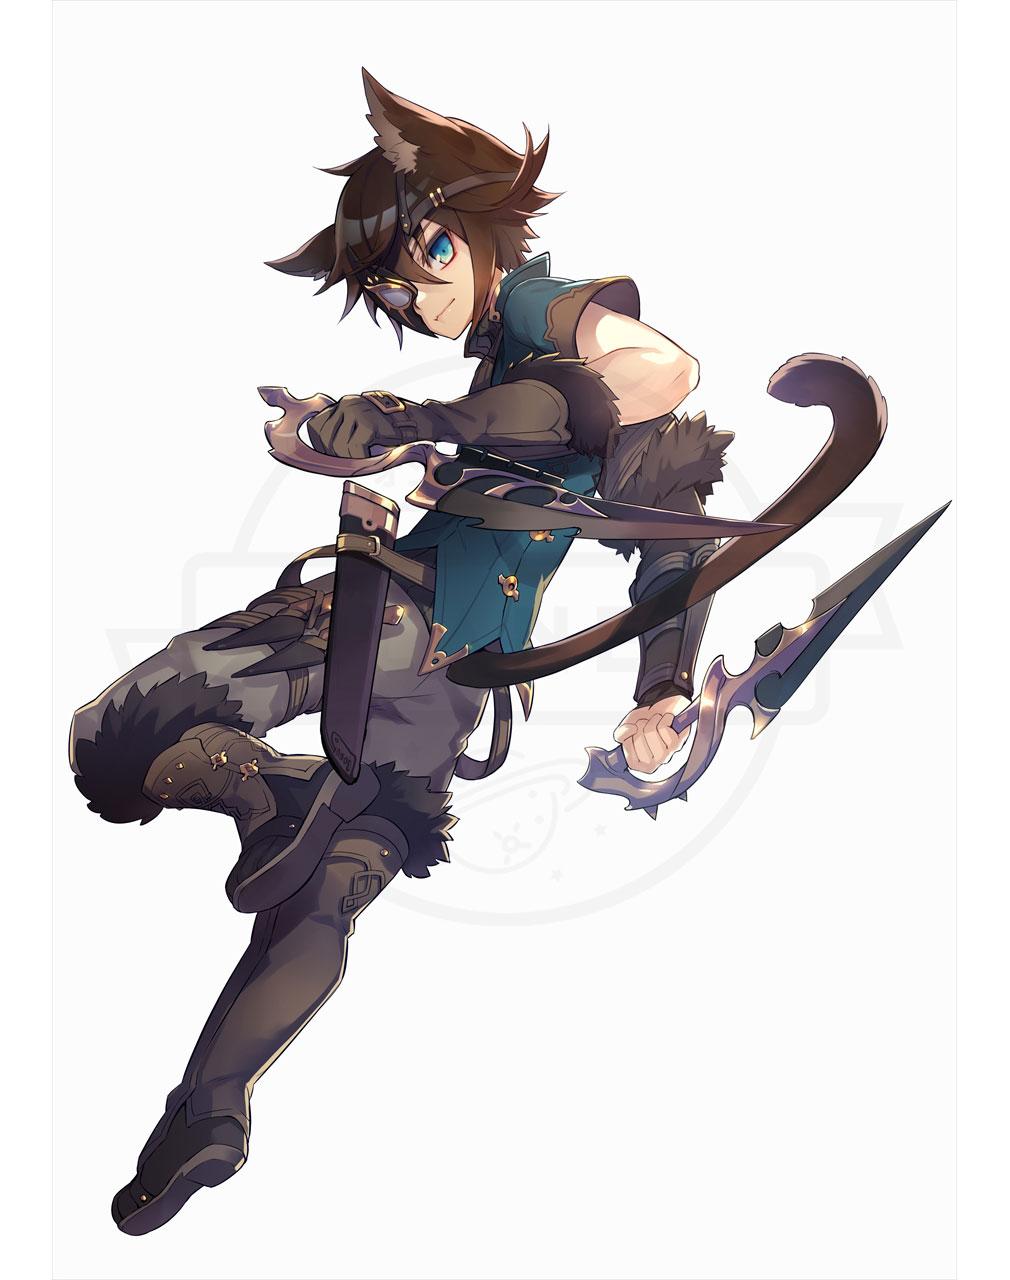 Ash Tale (アッシュテイル) 風の大陸 キャラクター『リンク』イメージ紹介